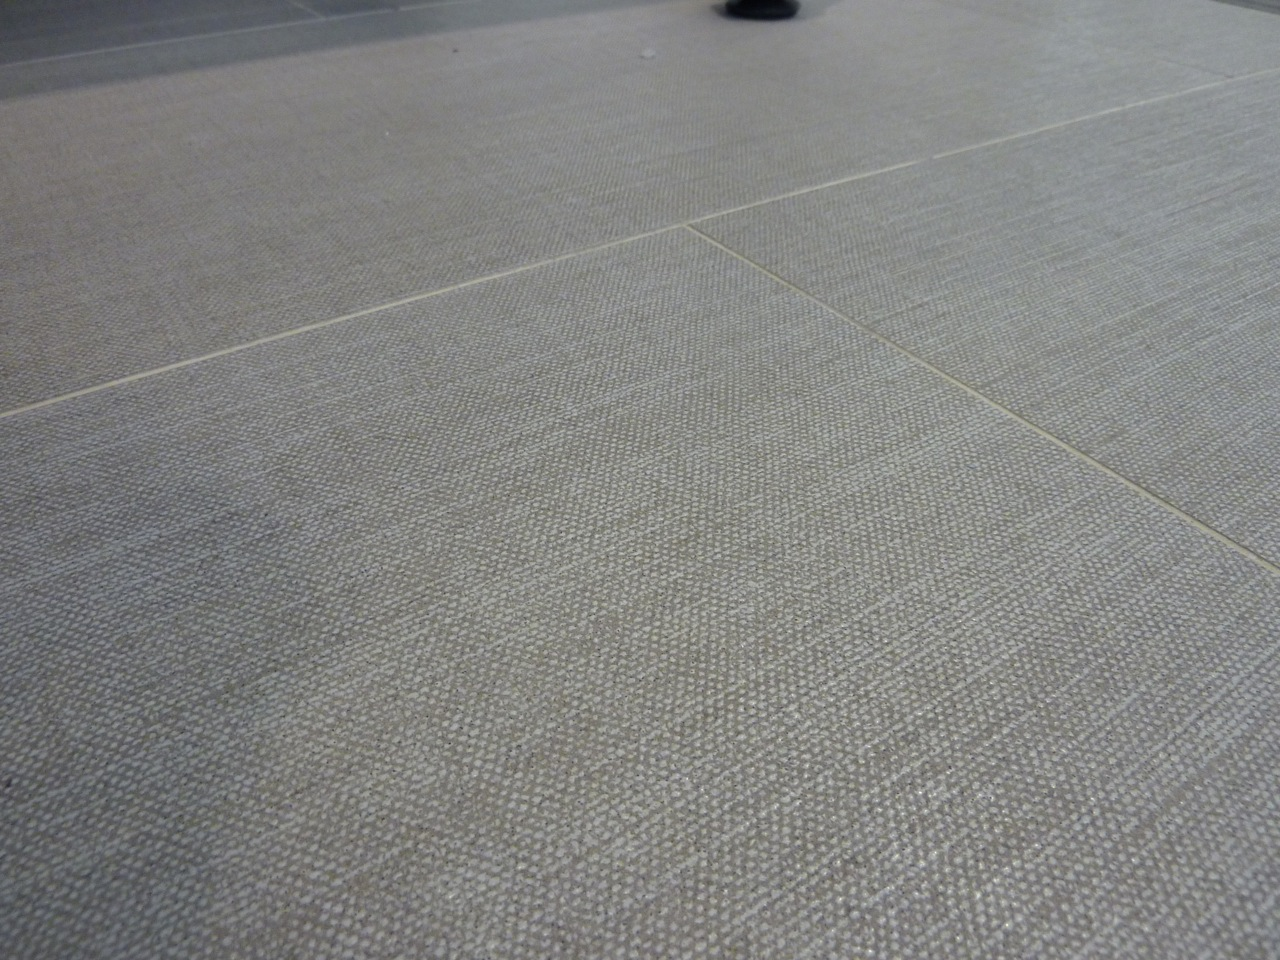 Flooring mod remod fab linen tile doublecrazyfo Image collections